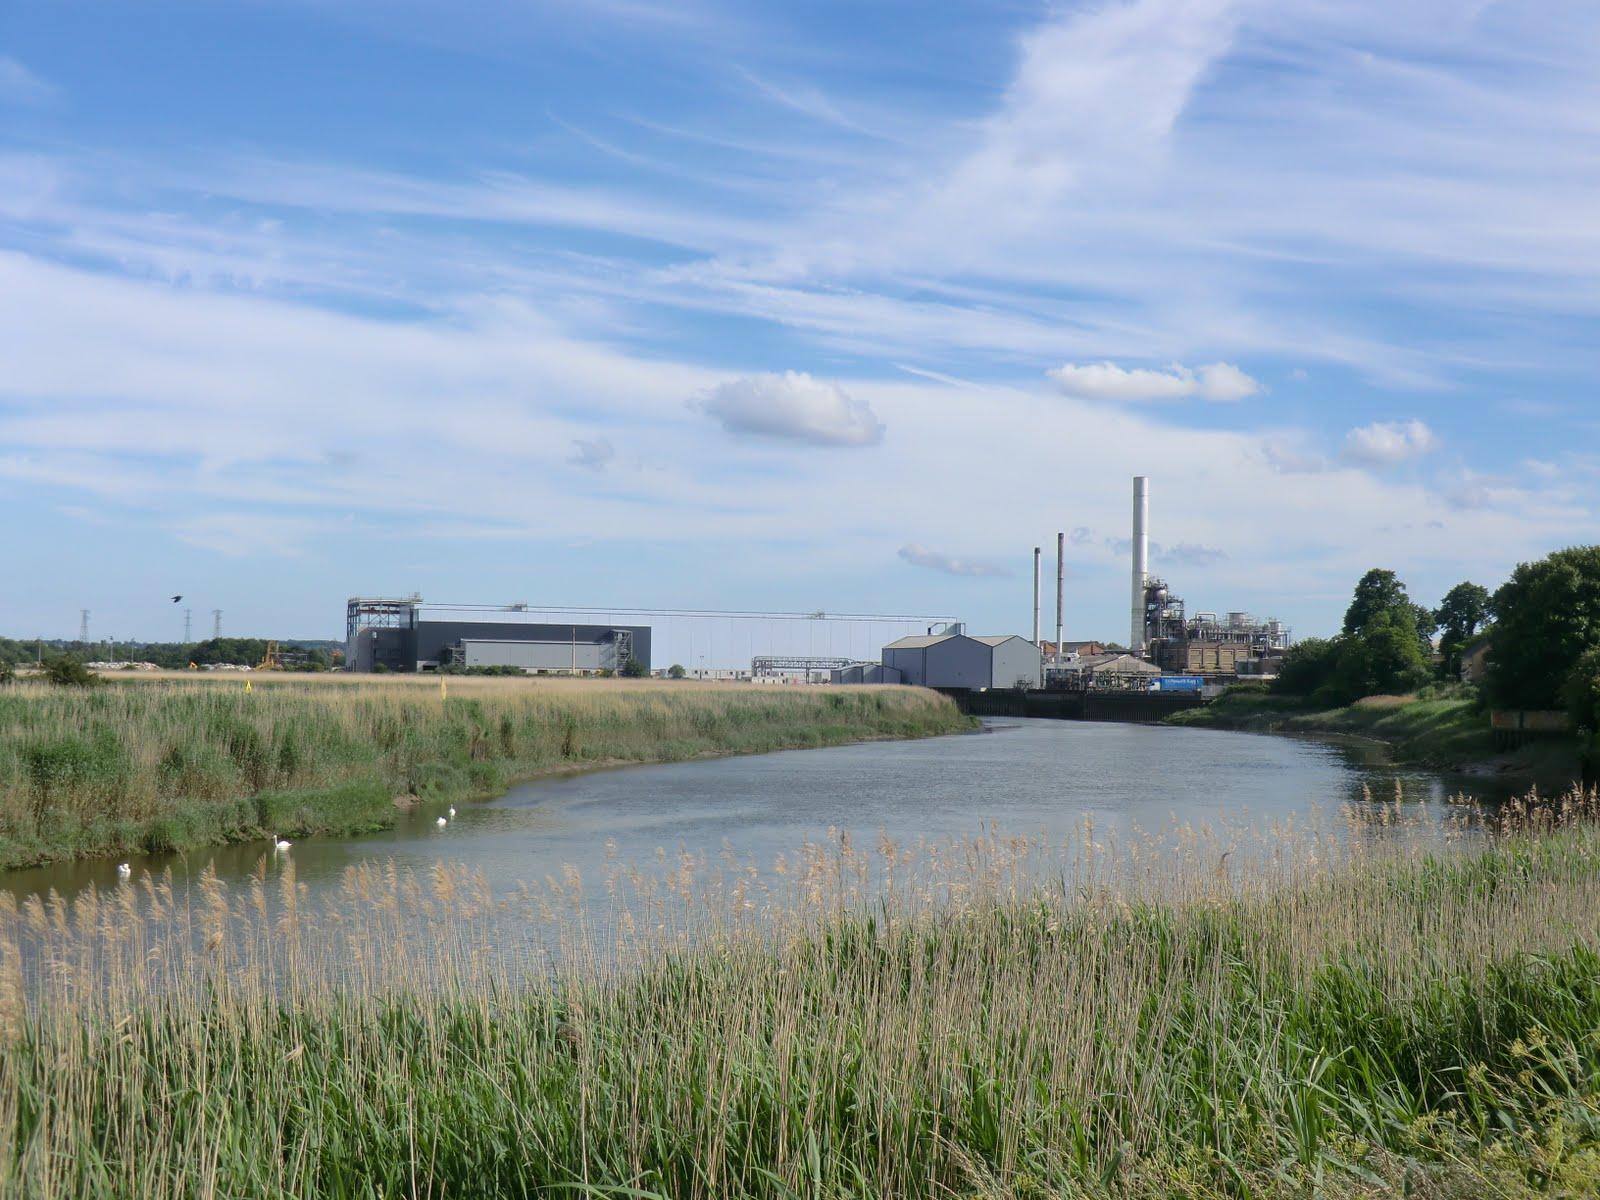 CIMG1942 Snodland's paper mill beside the River Medway